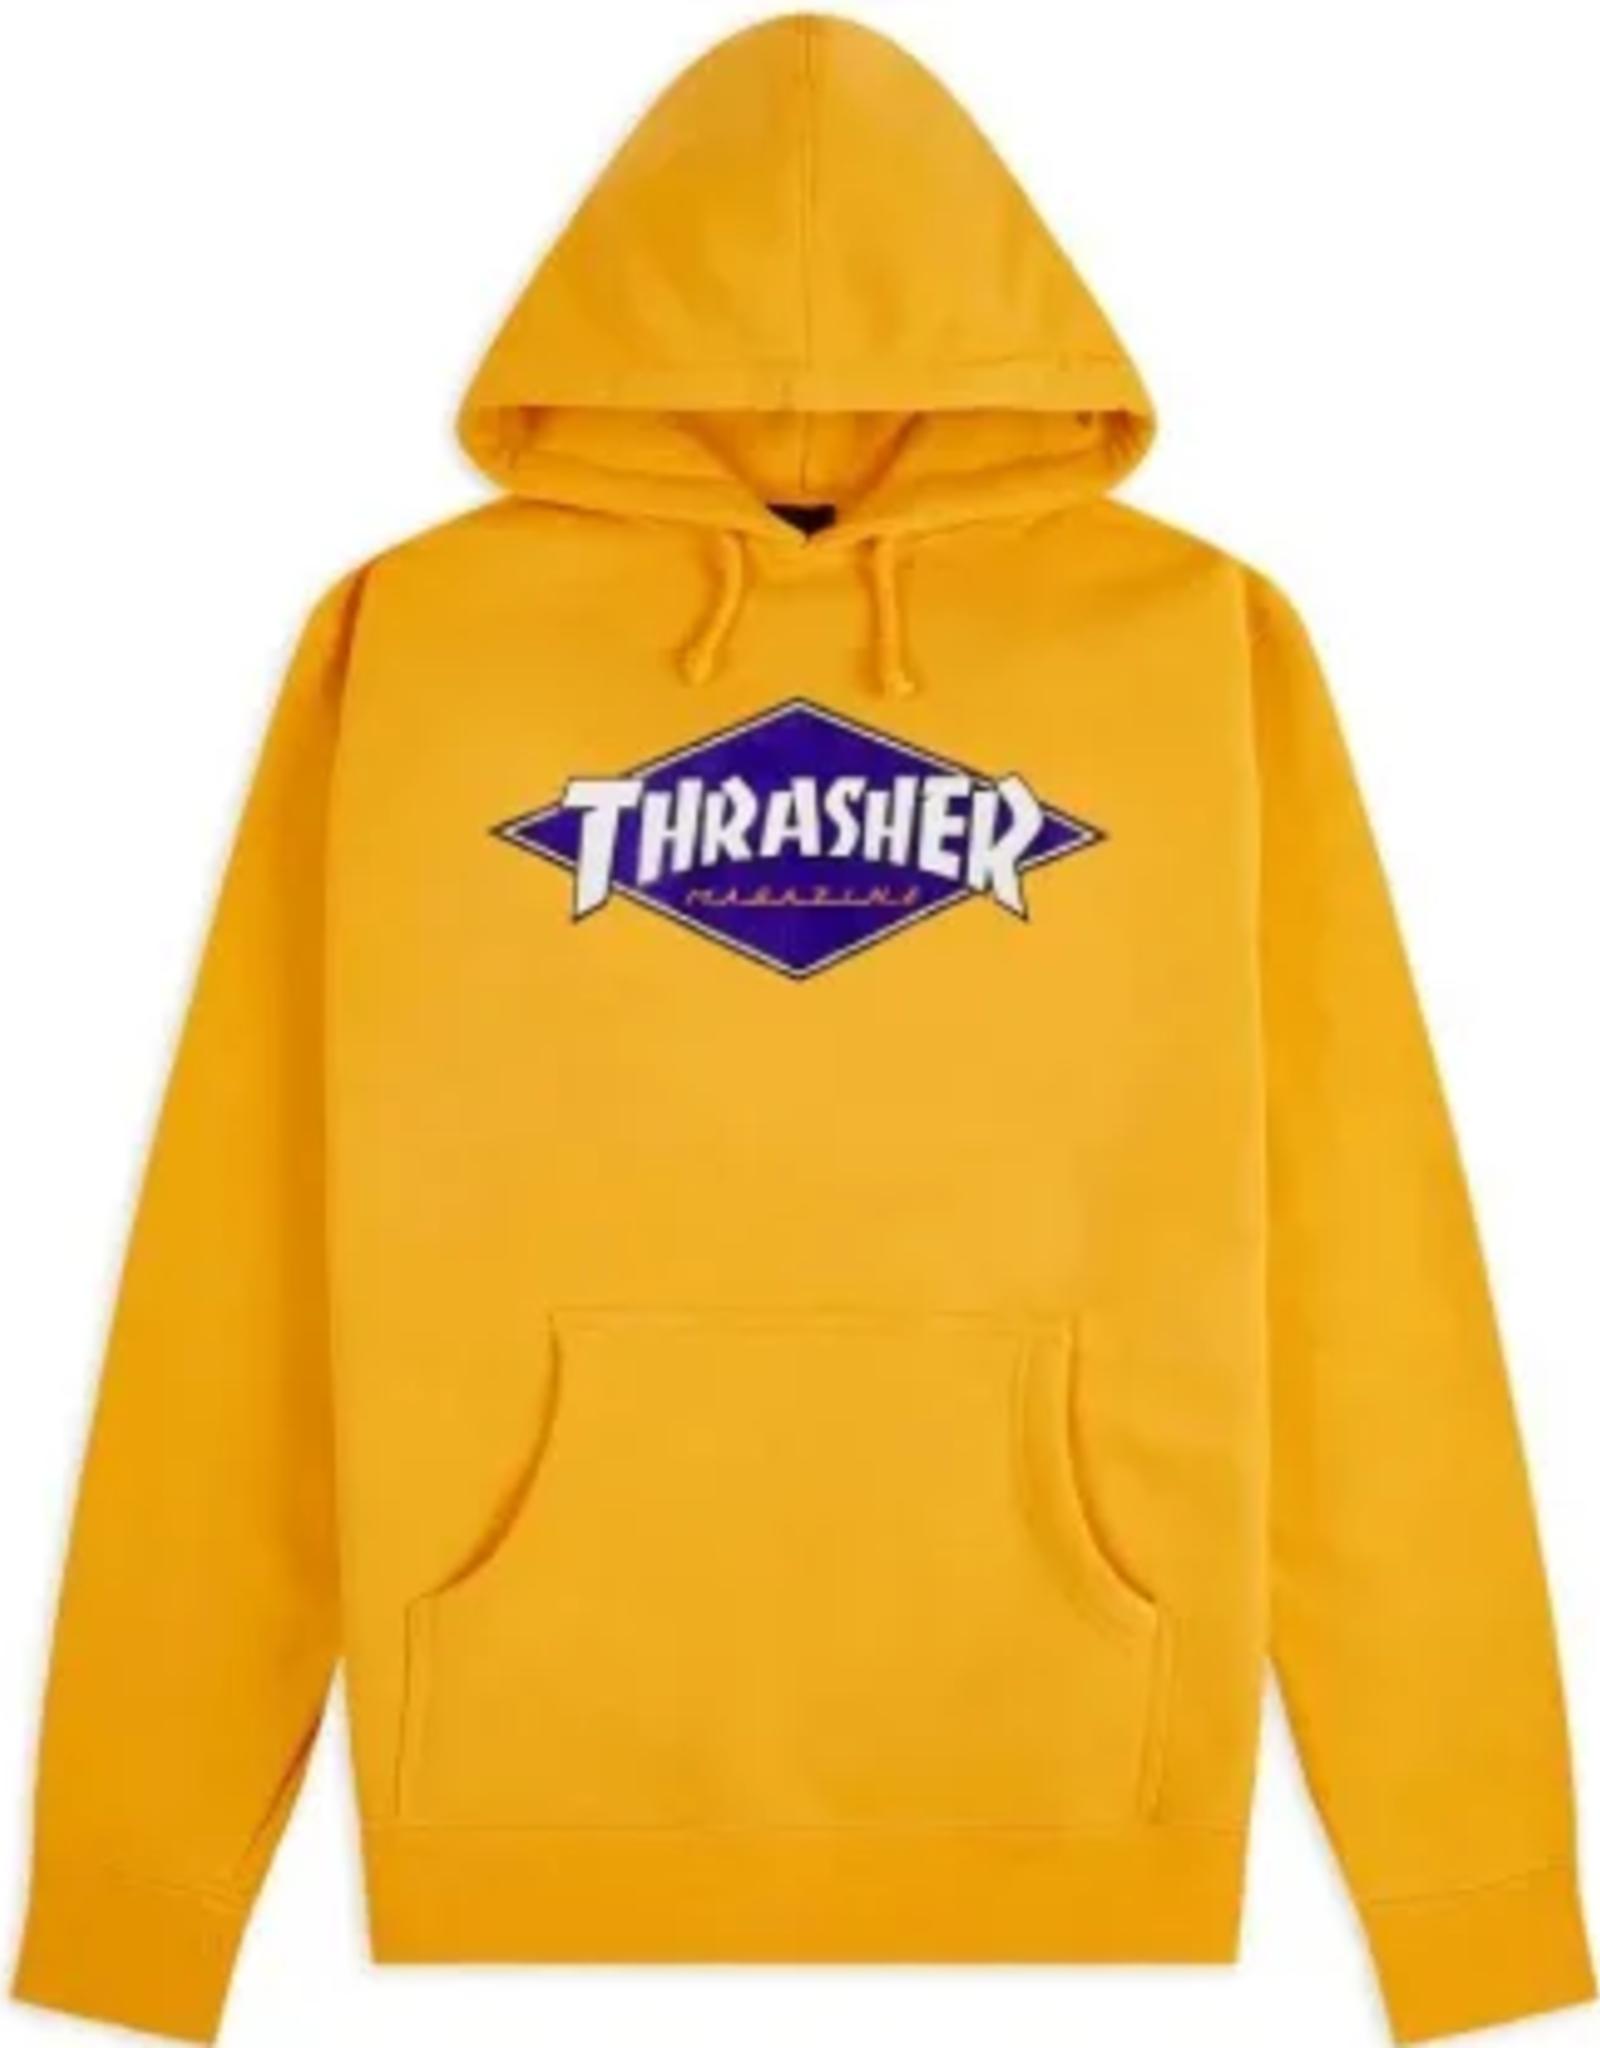 THRASHER THRASHER DIAMOND PO HOODIE